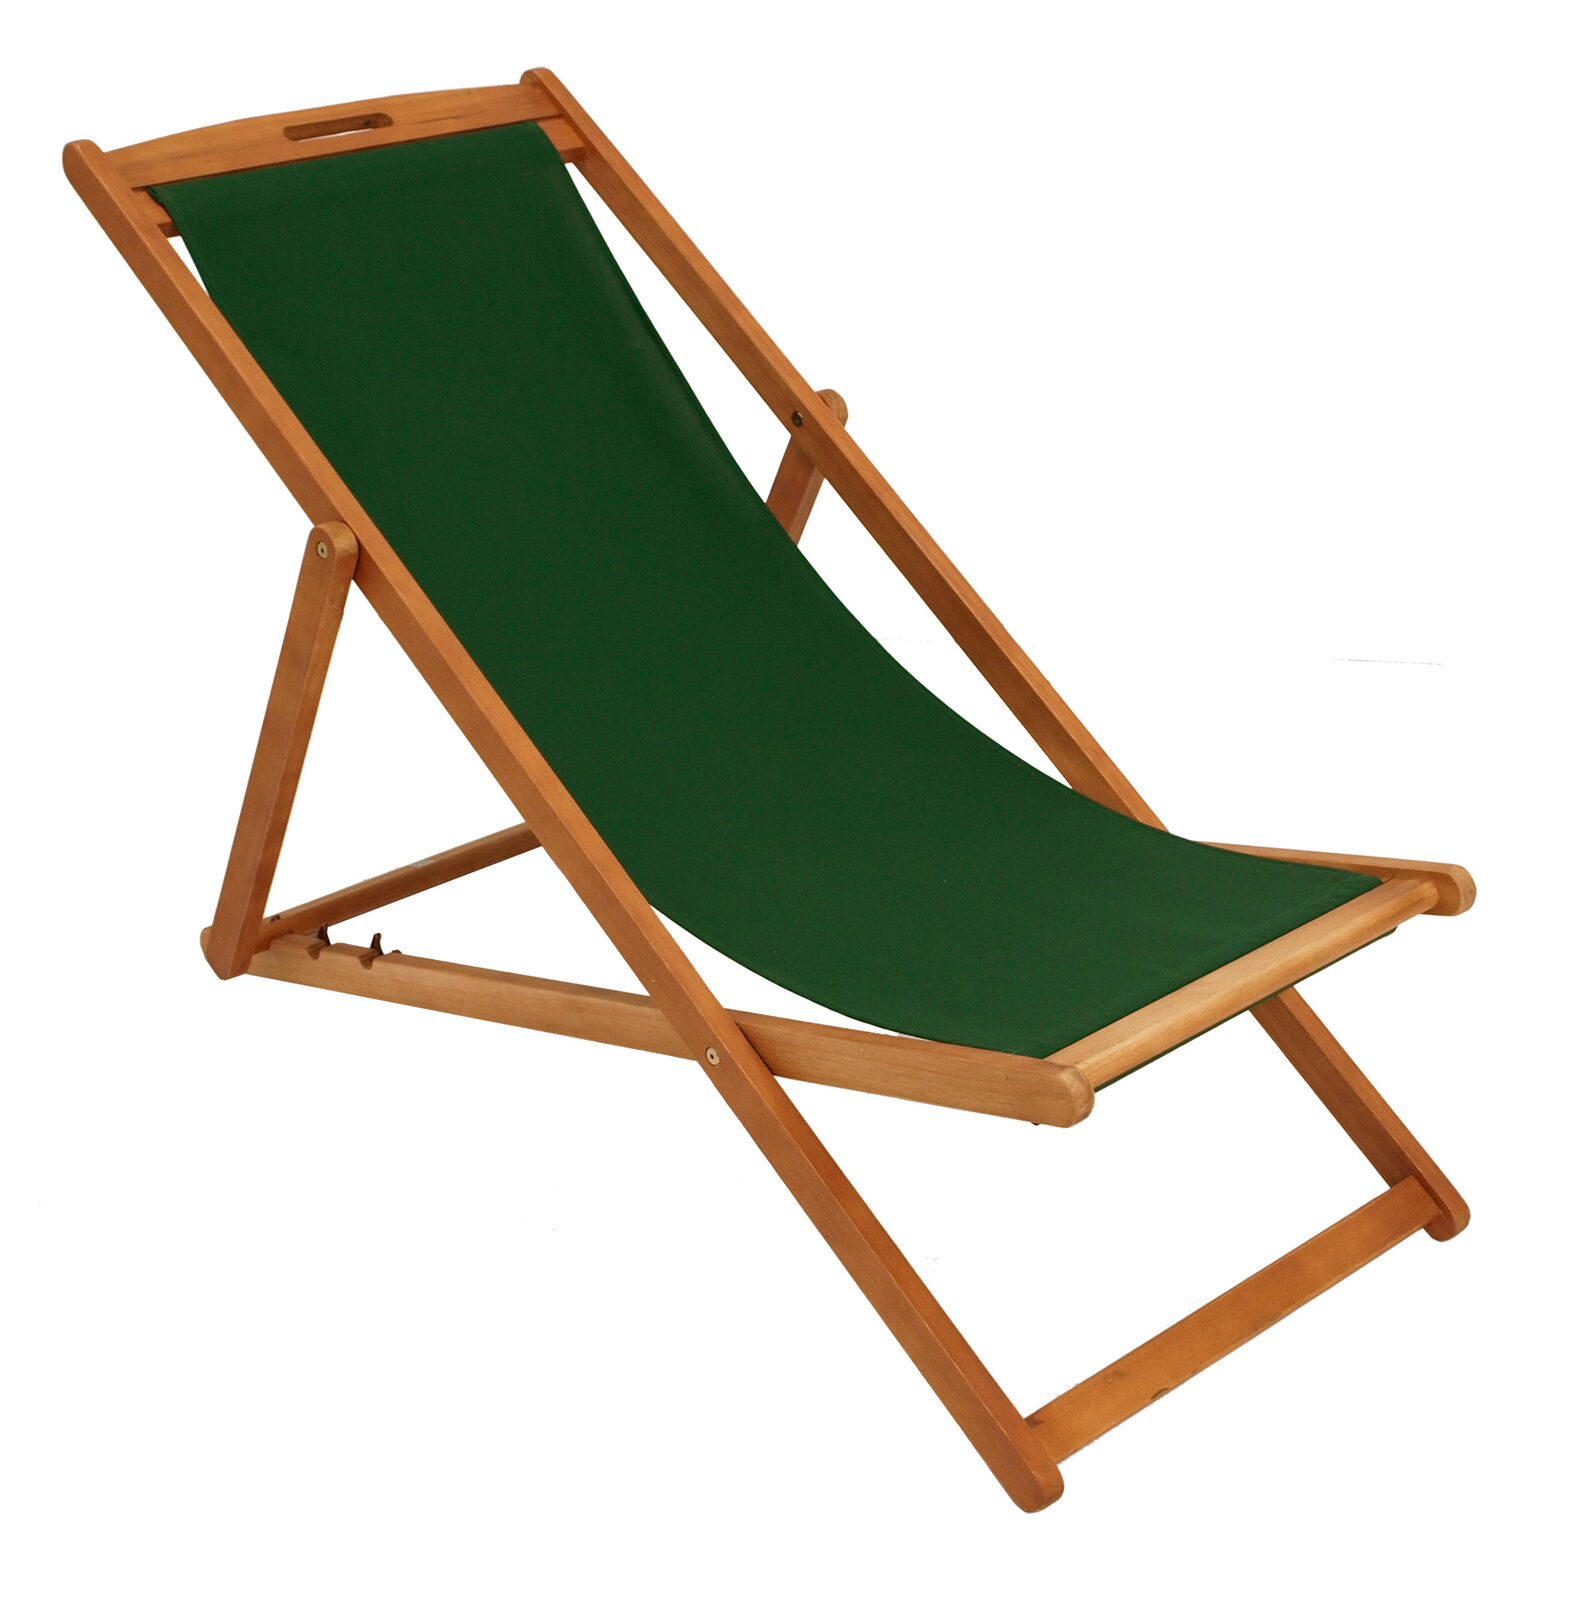 Full Size of Liegestuhl Klappbar Ikea Holz Garten Obi Bauhaus Lidl Lafuma Küche Kosten Miniküche Betten 160x200 Bei Sofa Mit Schlaffunktion Kaufen Bett Ausklappbar Wohnzimmer Liegestuhl Klappbar Ikea